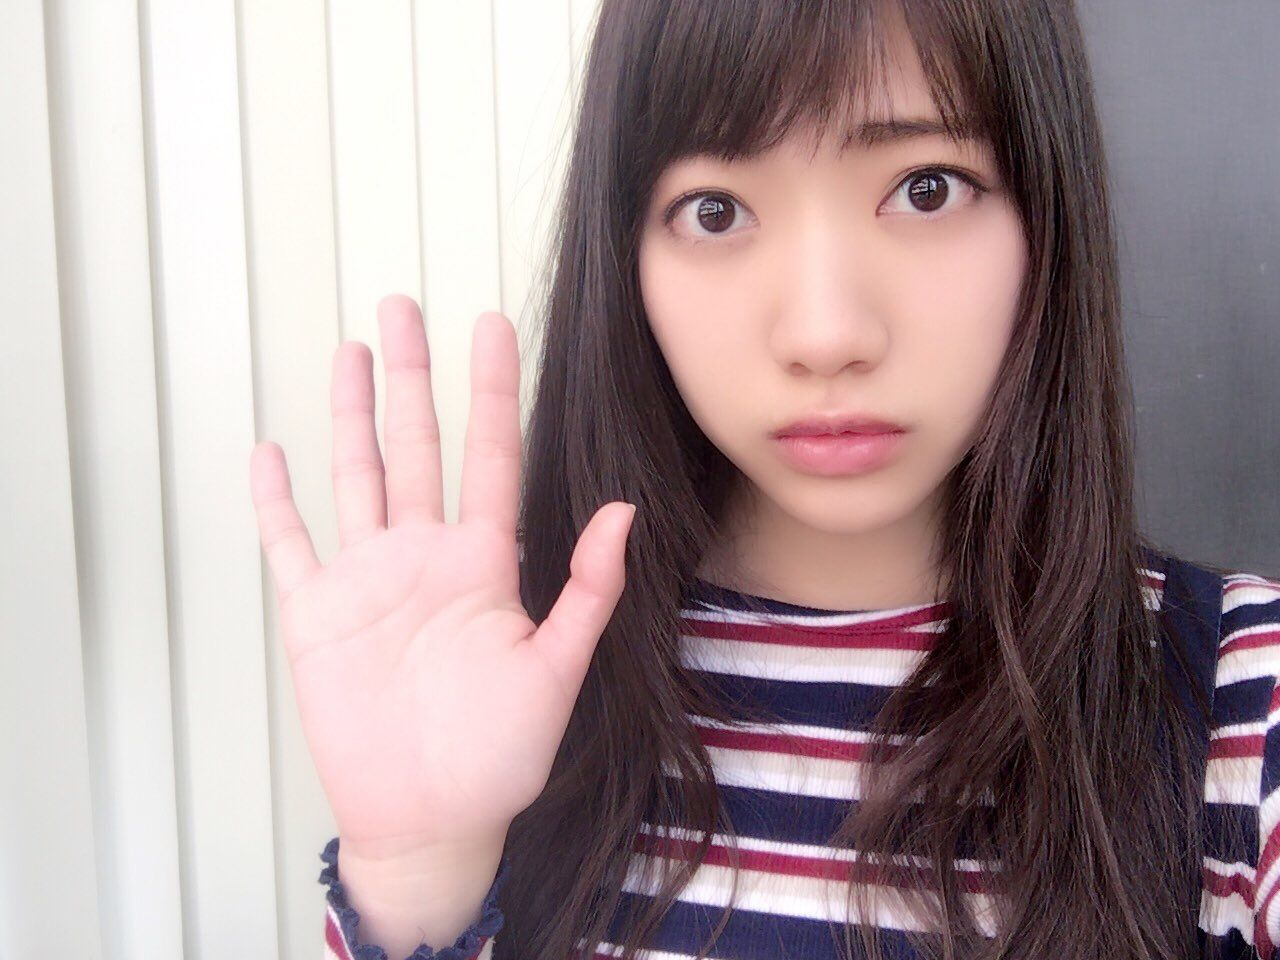 SKE48卒業生]2月14日小林亜実(こあみ)まとめ! : SKE48まとめ ブリダス48